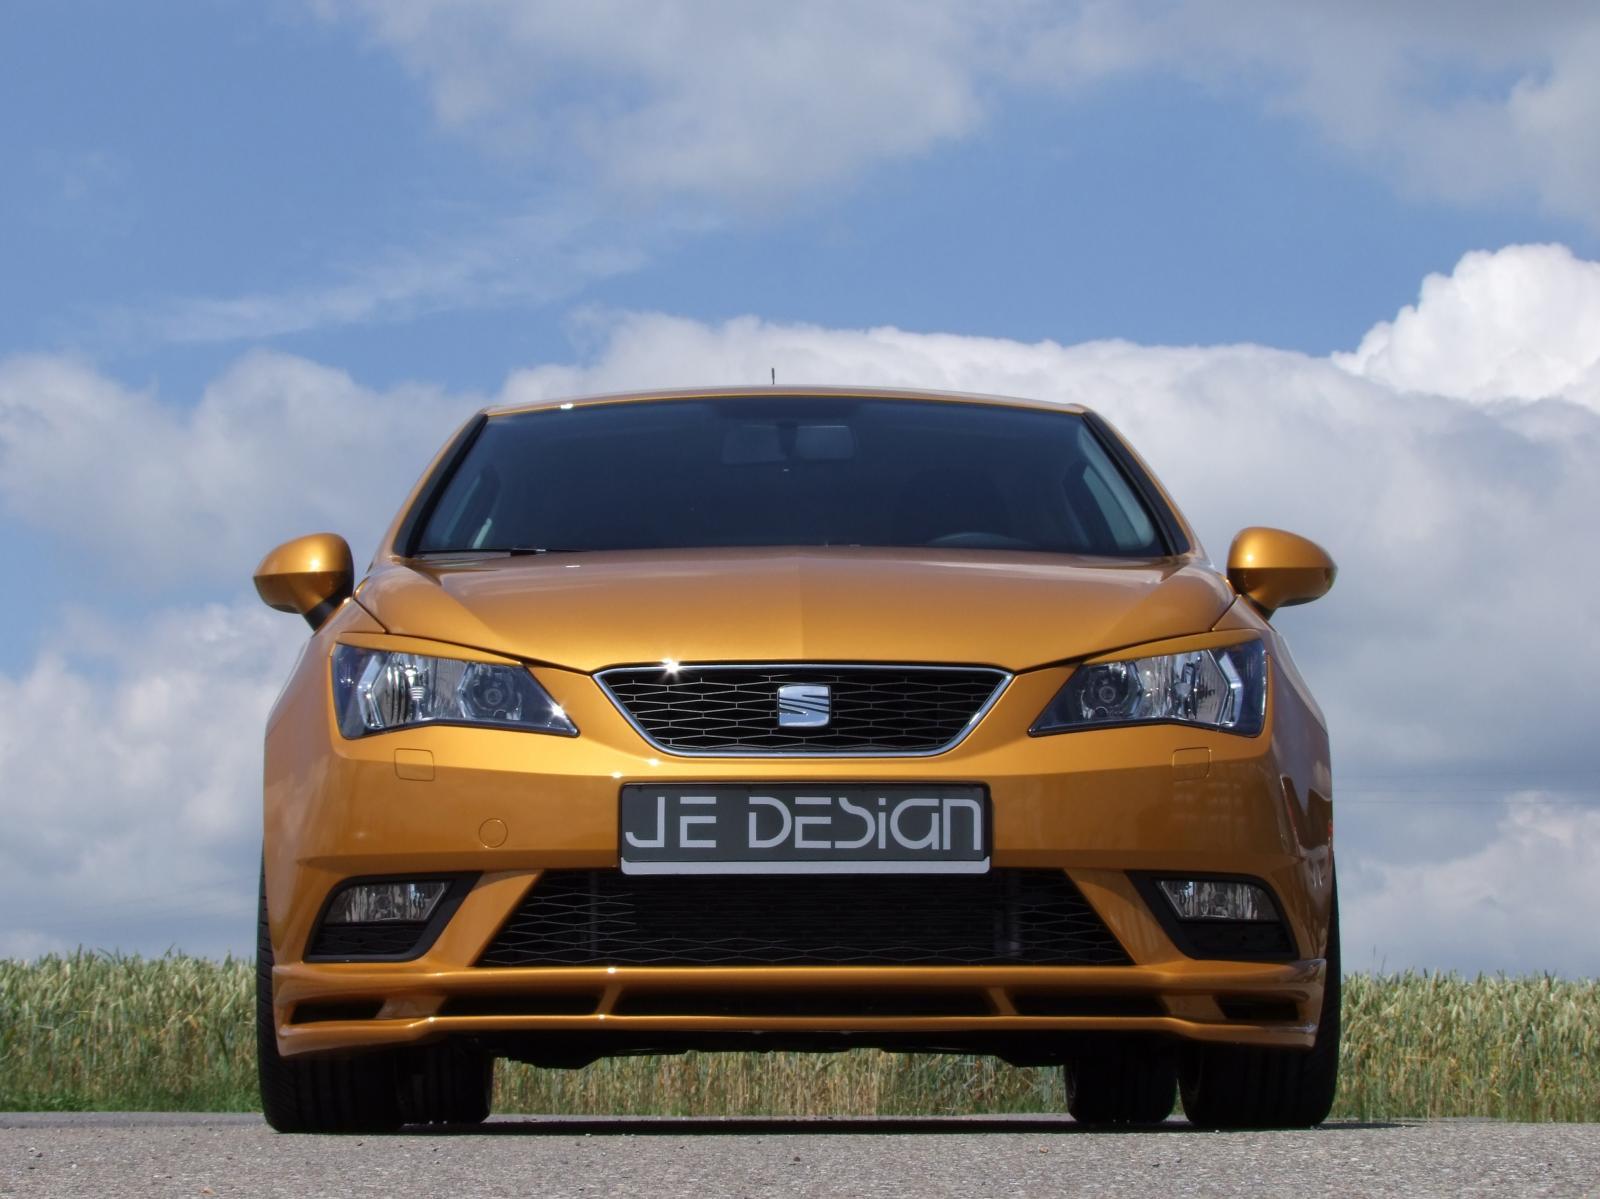 JE Design reveals Seat Ibiza tuning